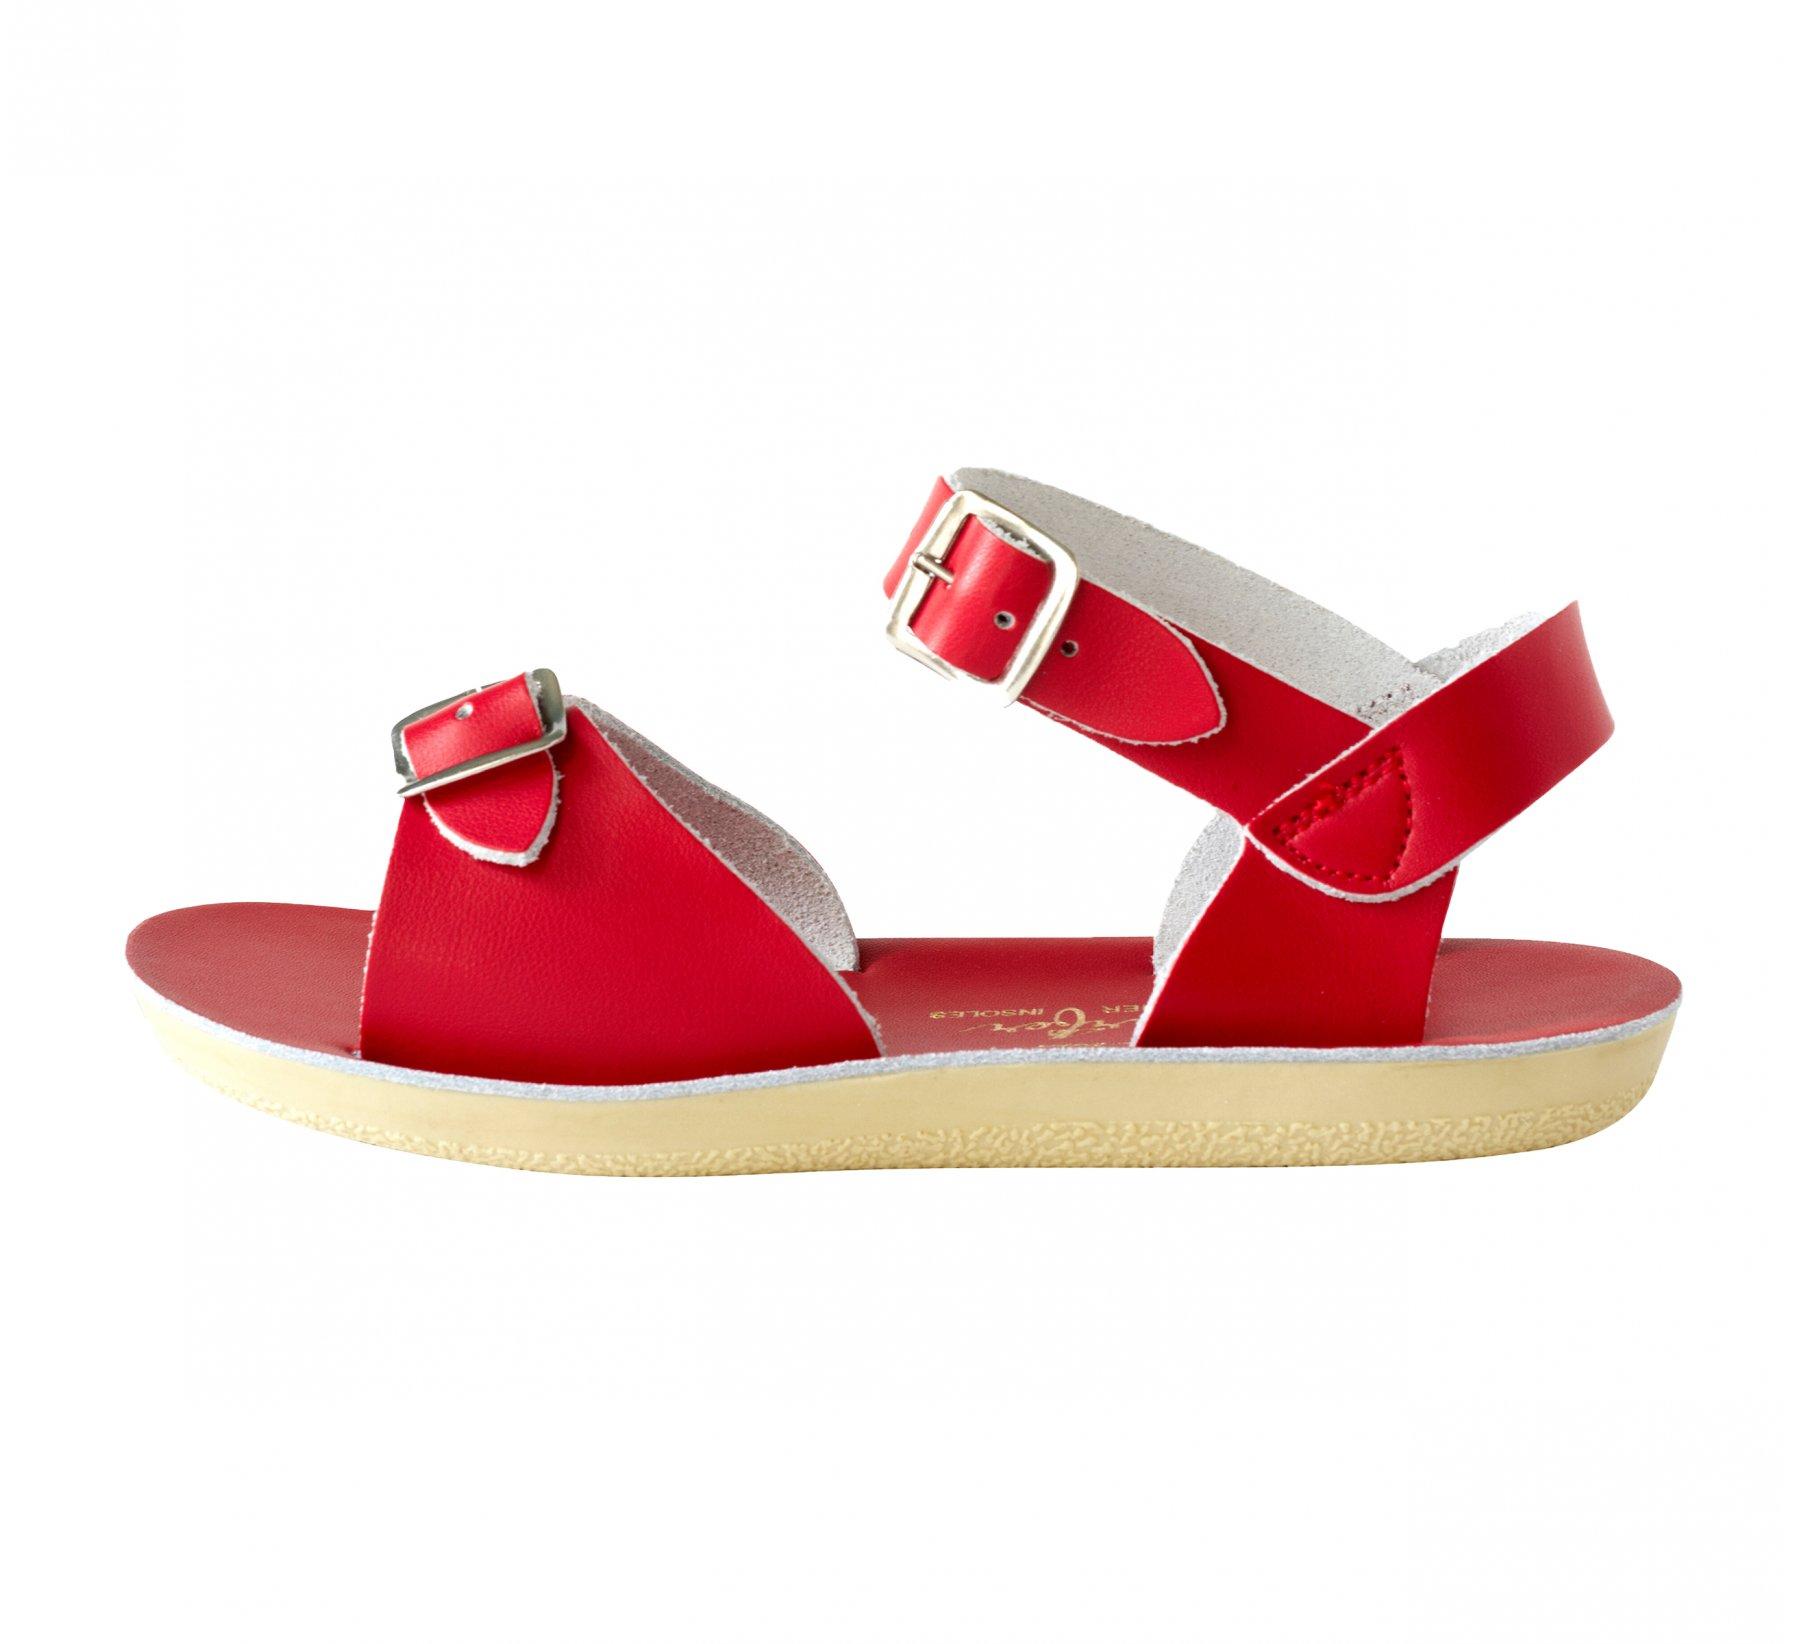 Surfer Red - Salt Water Sandals